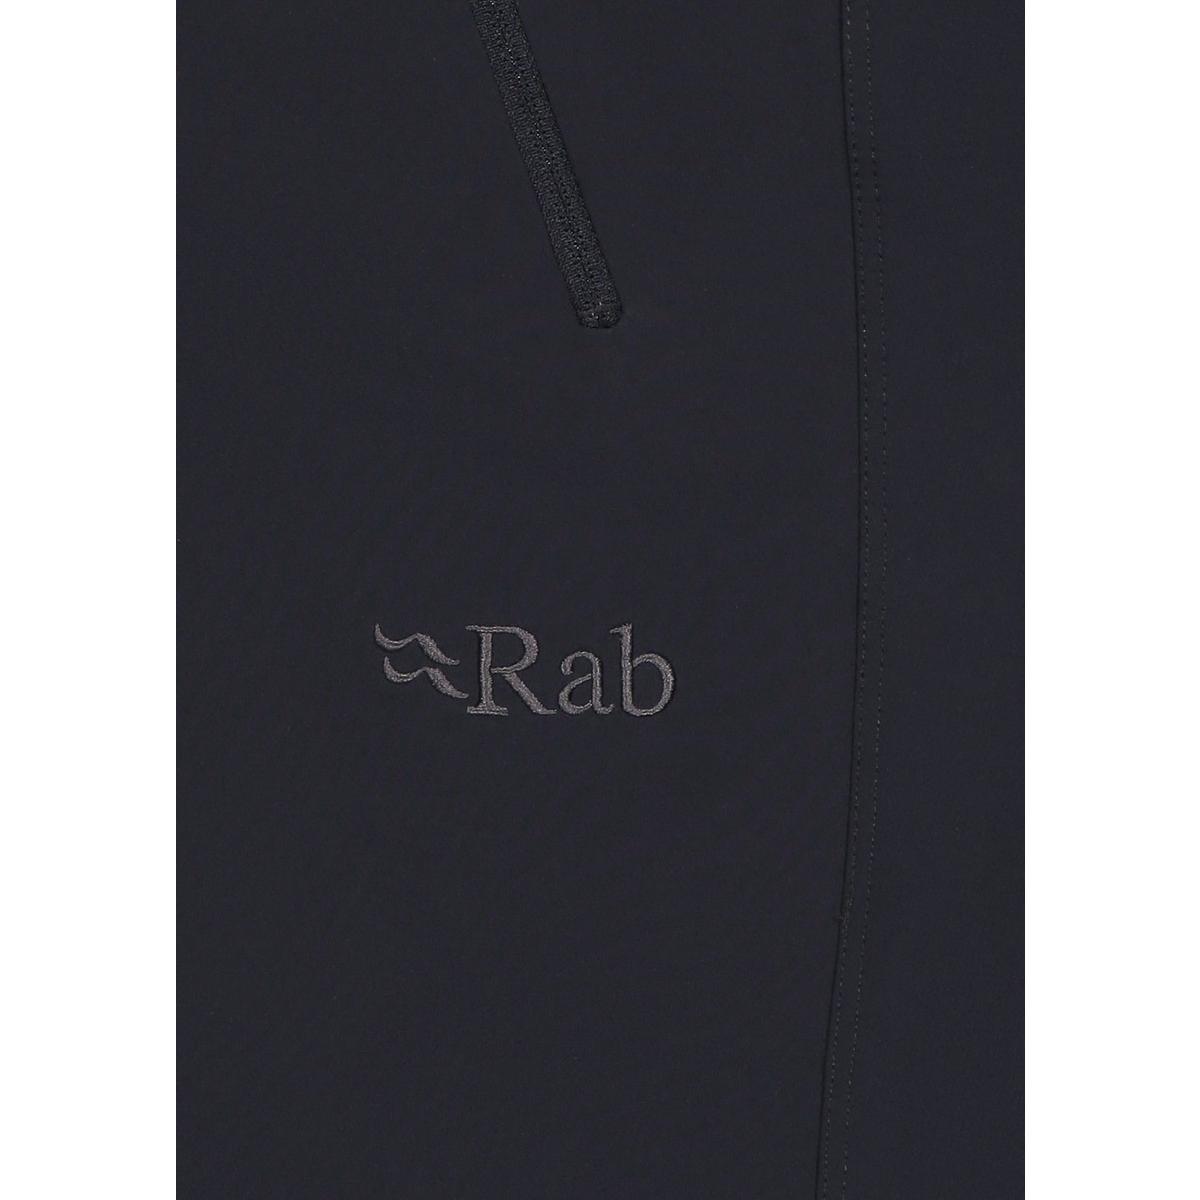 Rab Men's Incline AS Pant Regular - Ebony